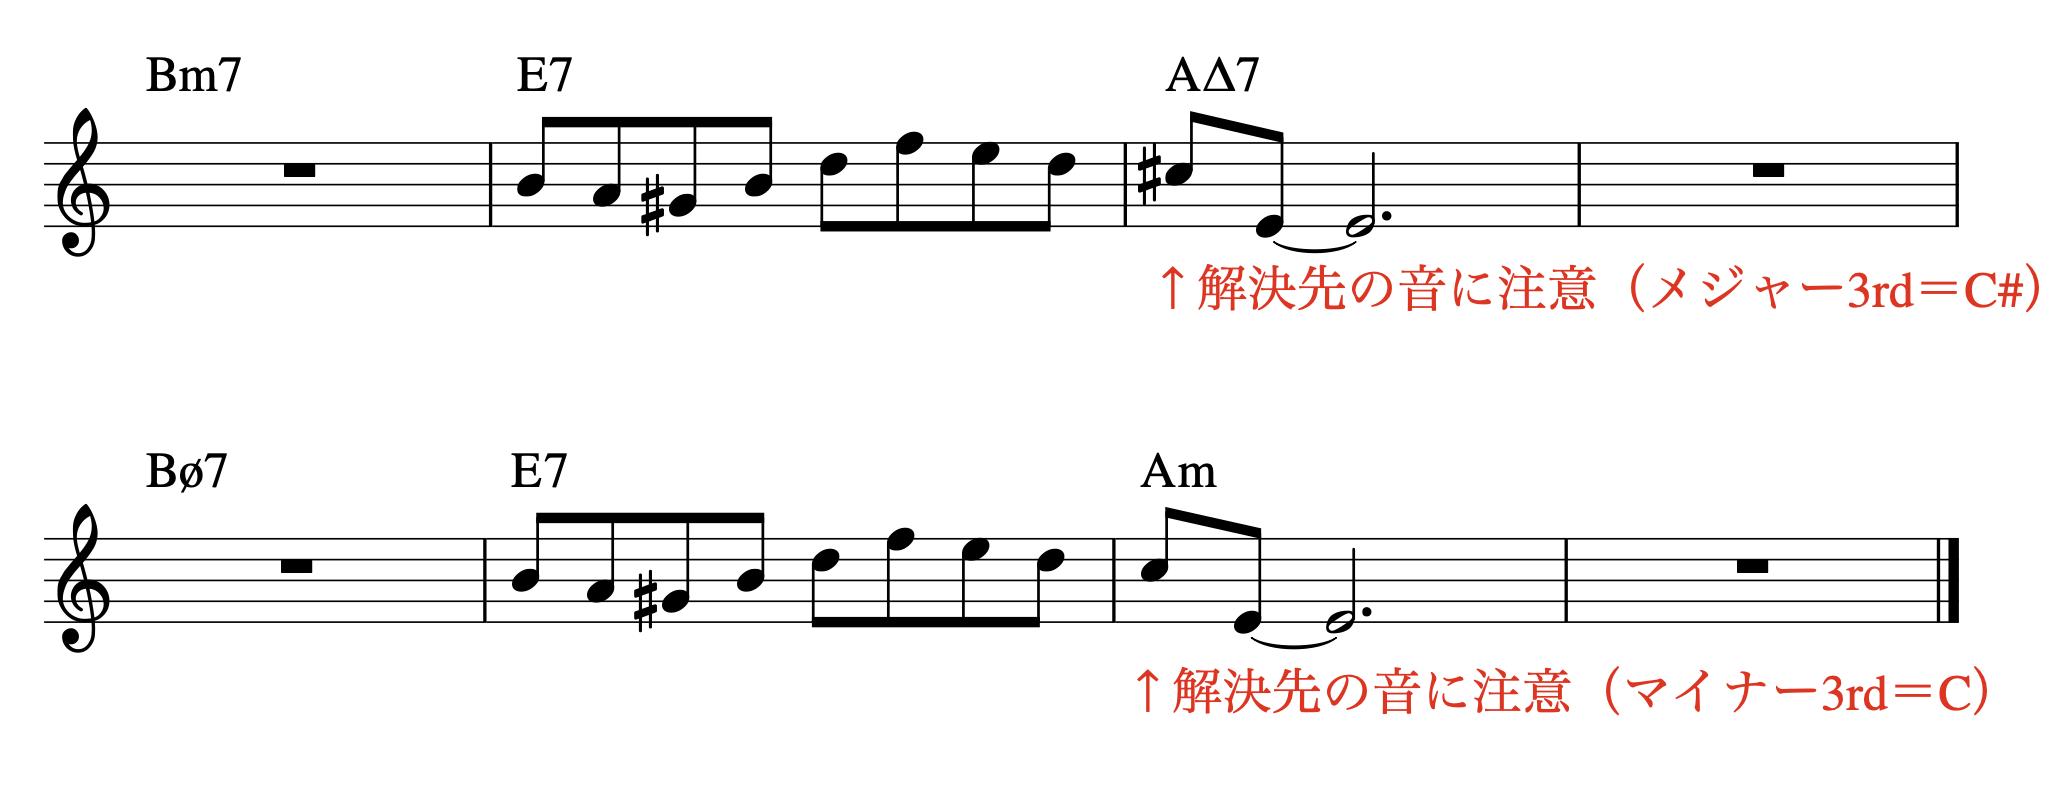 minor25-dominant